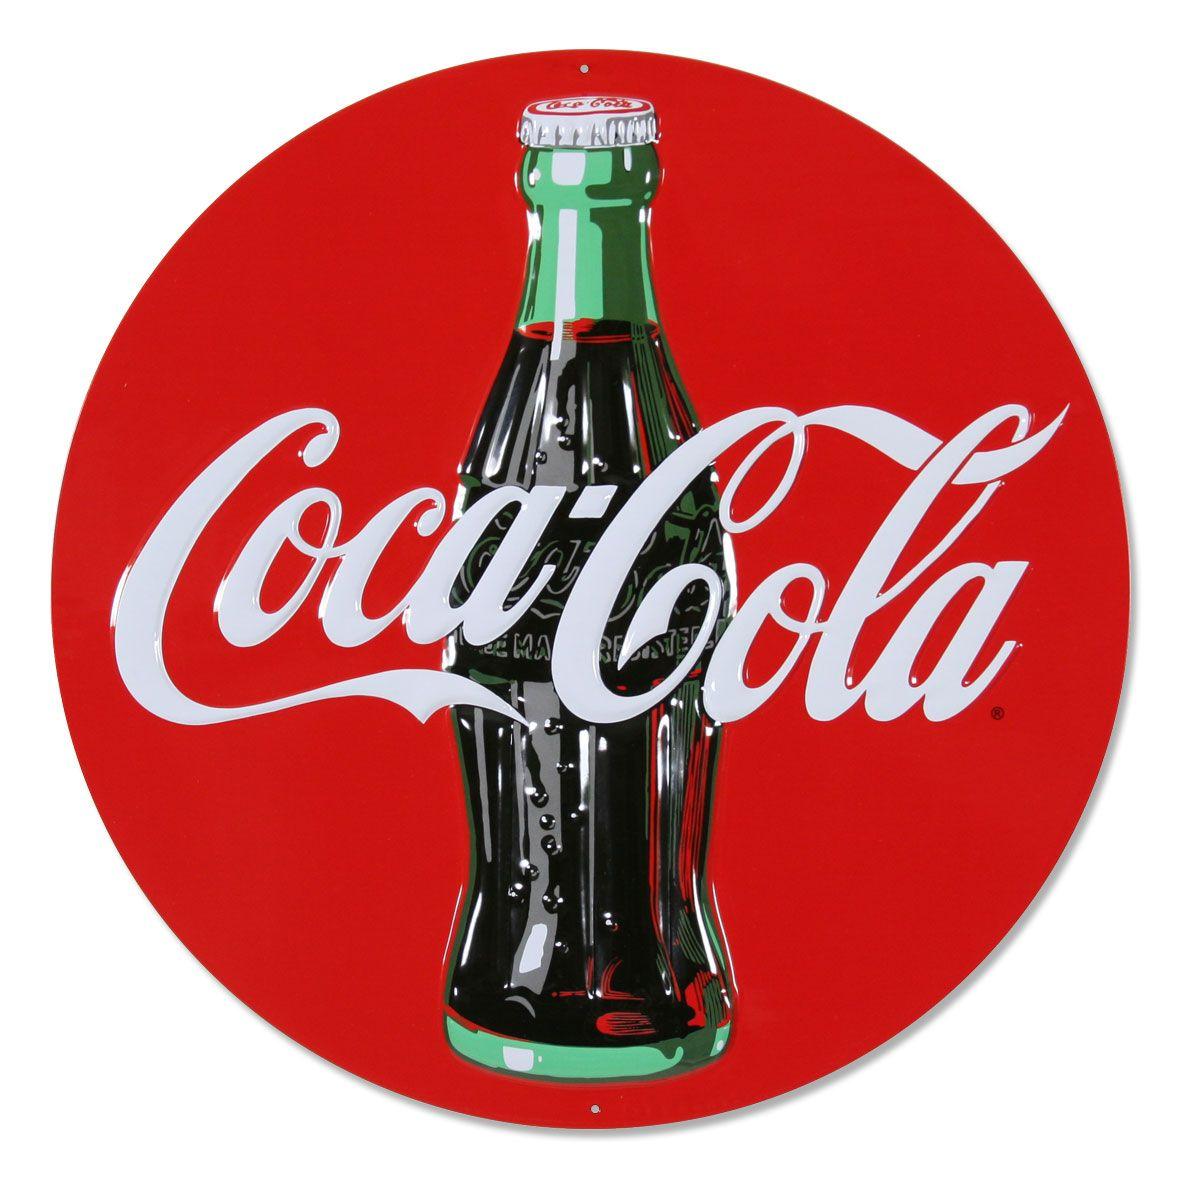 Coca Cola Bathroom Decor - Coca cola red circle logo embossed metal sign